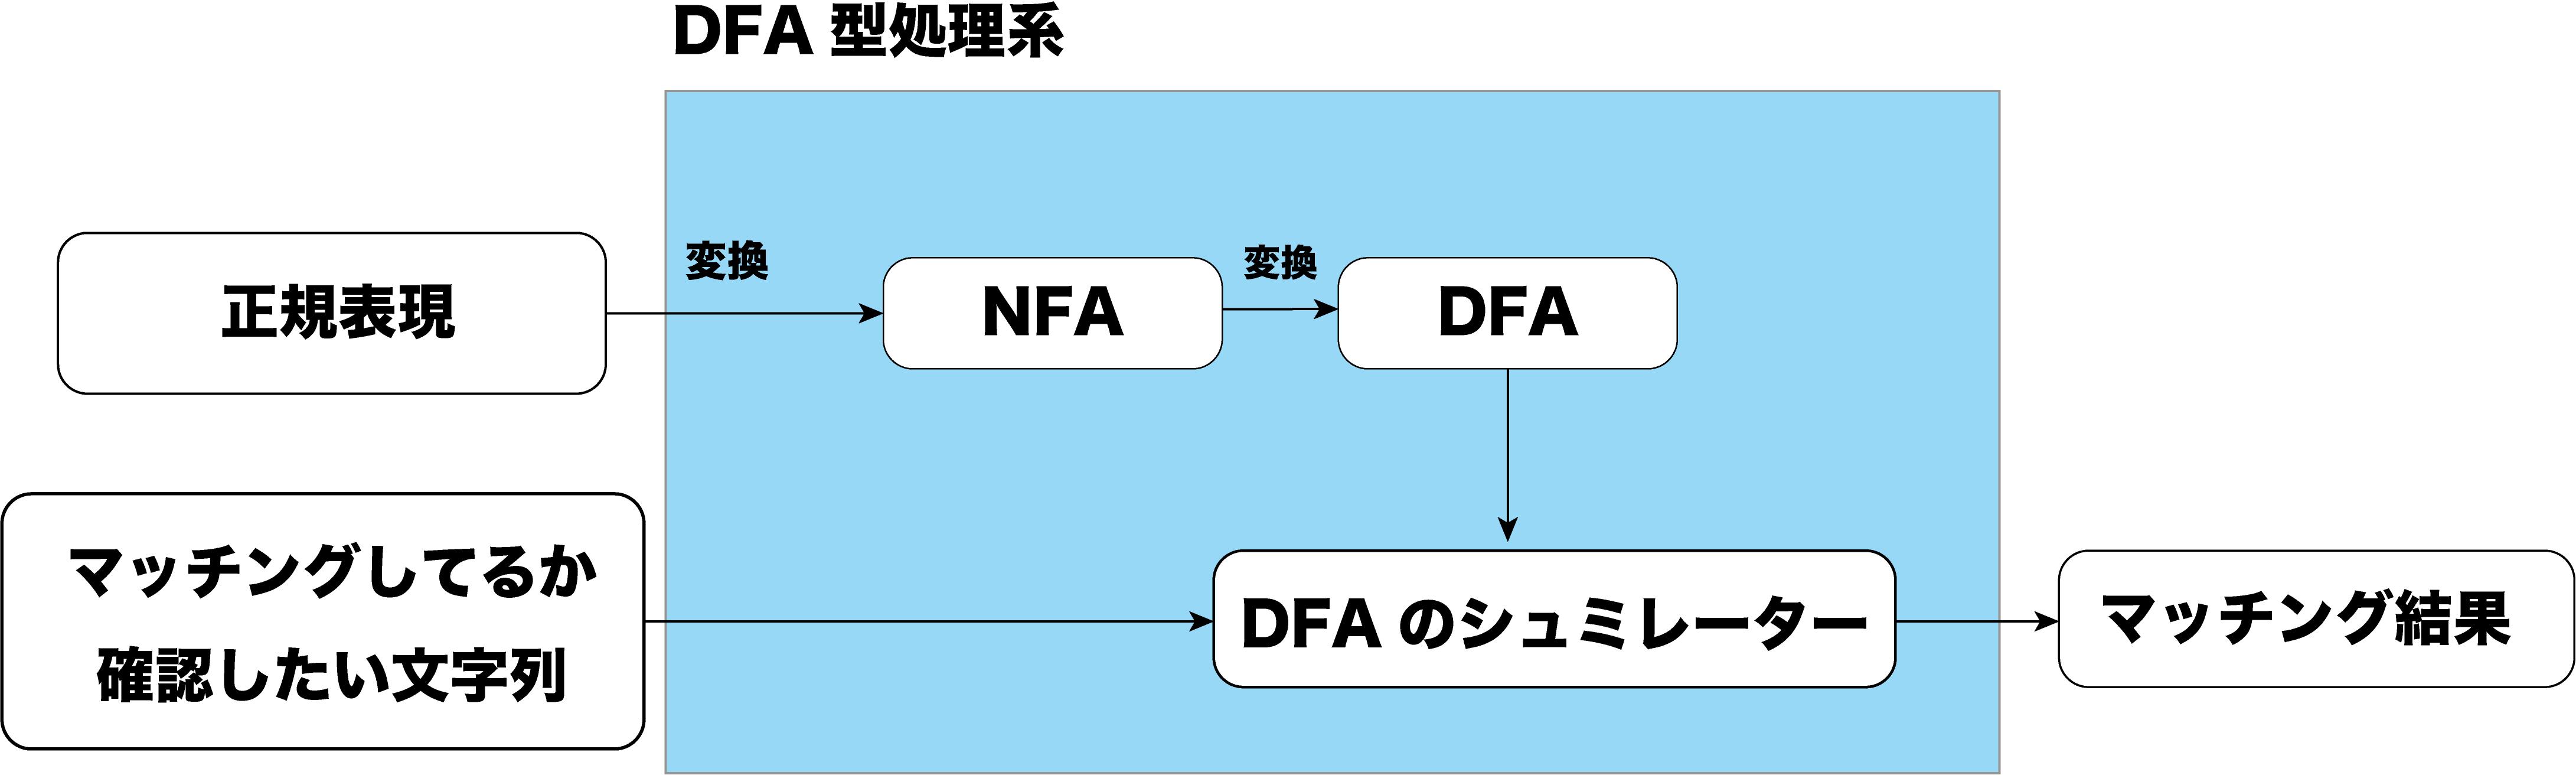 DFAエンジン.png